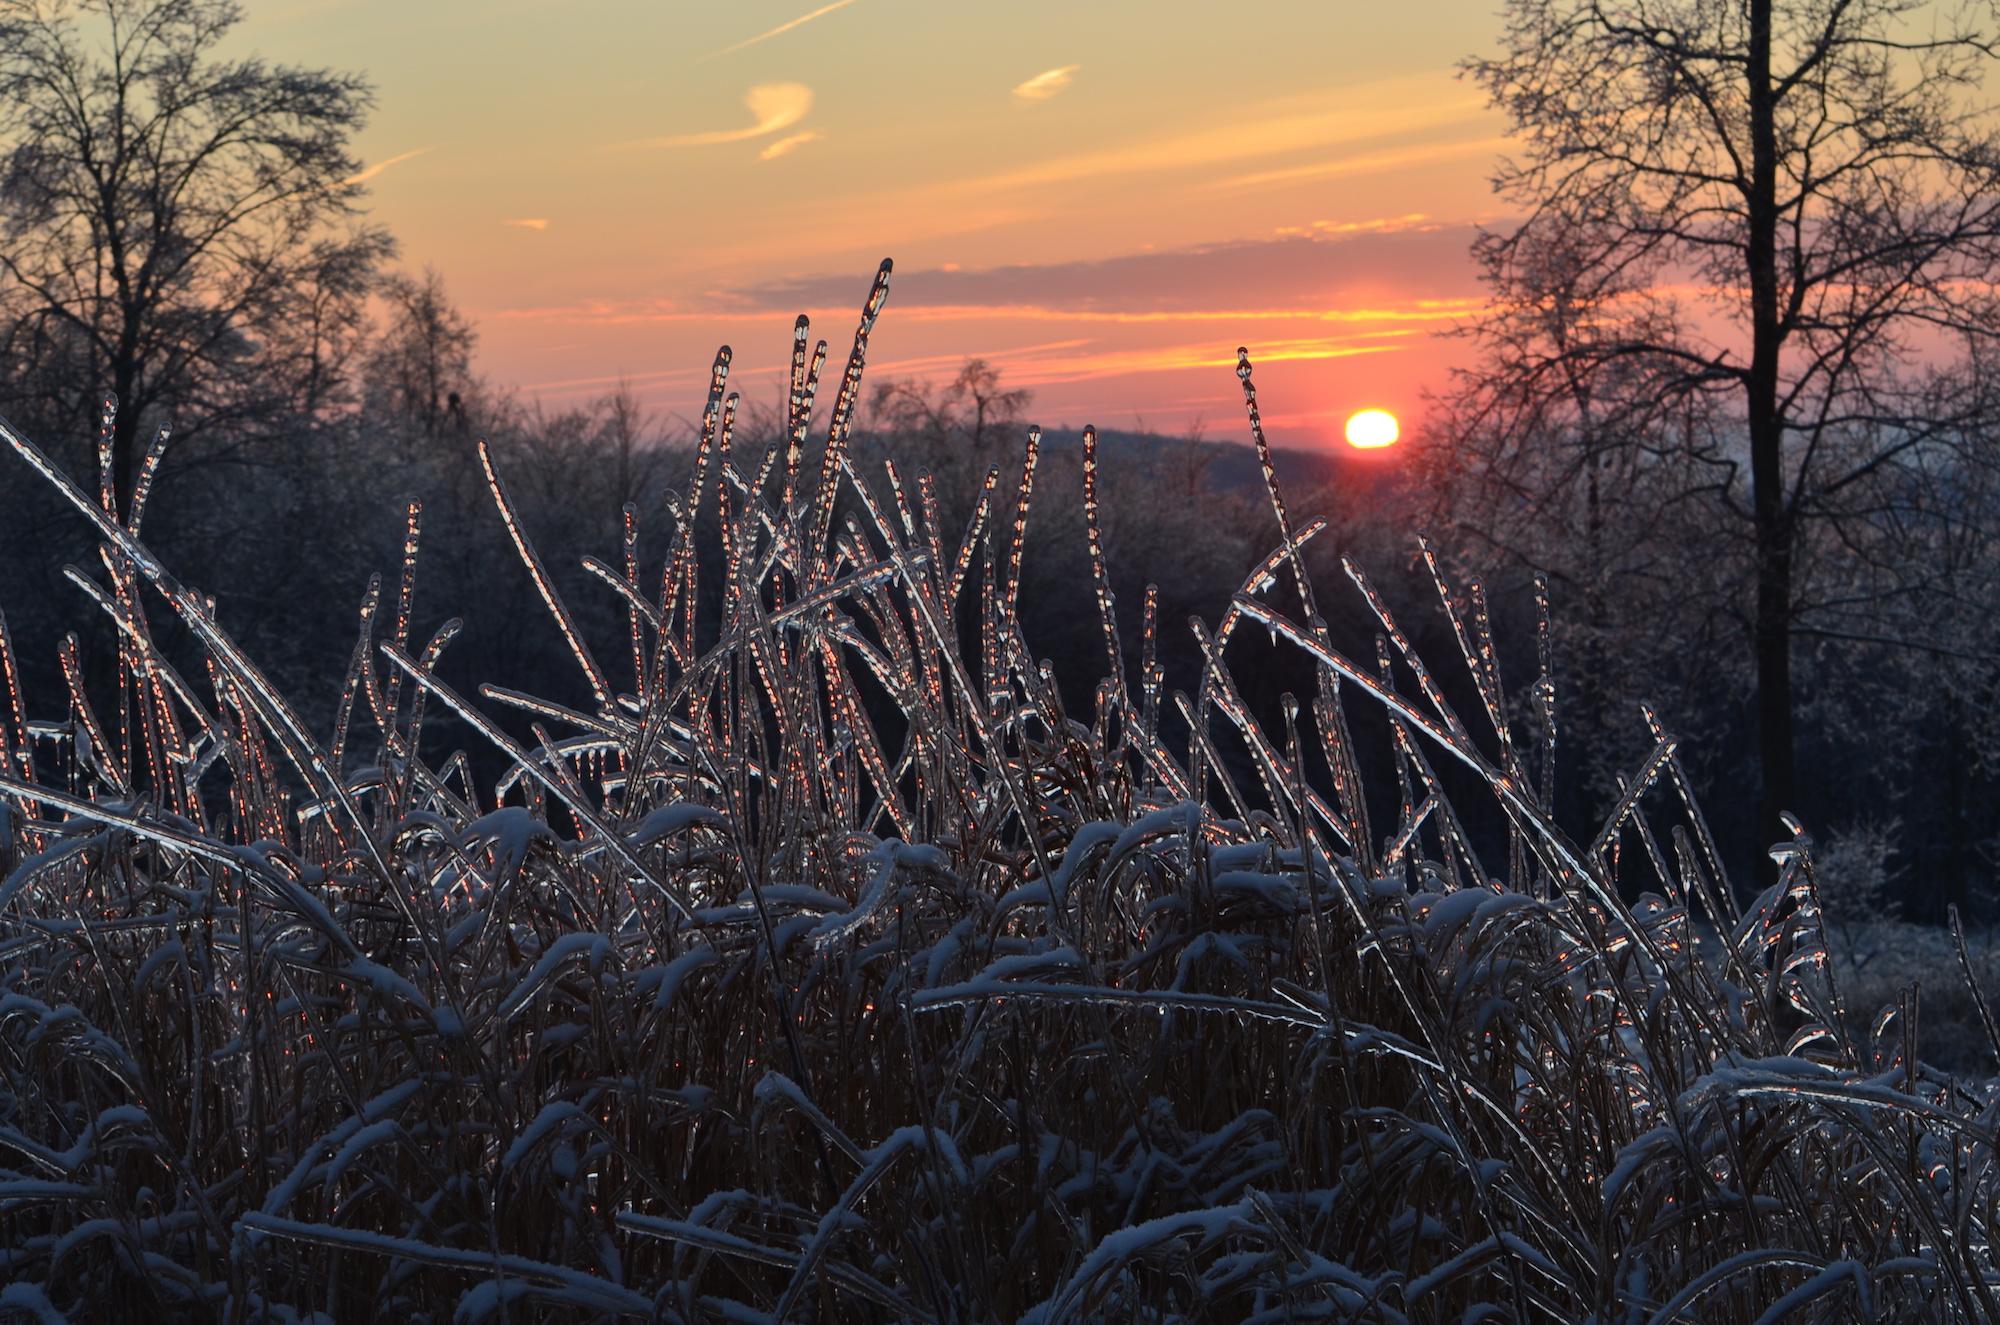 a sunset over frozen grasses